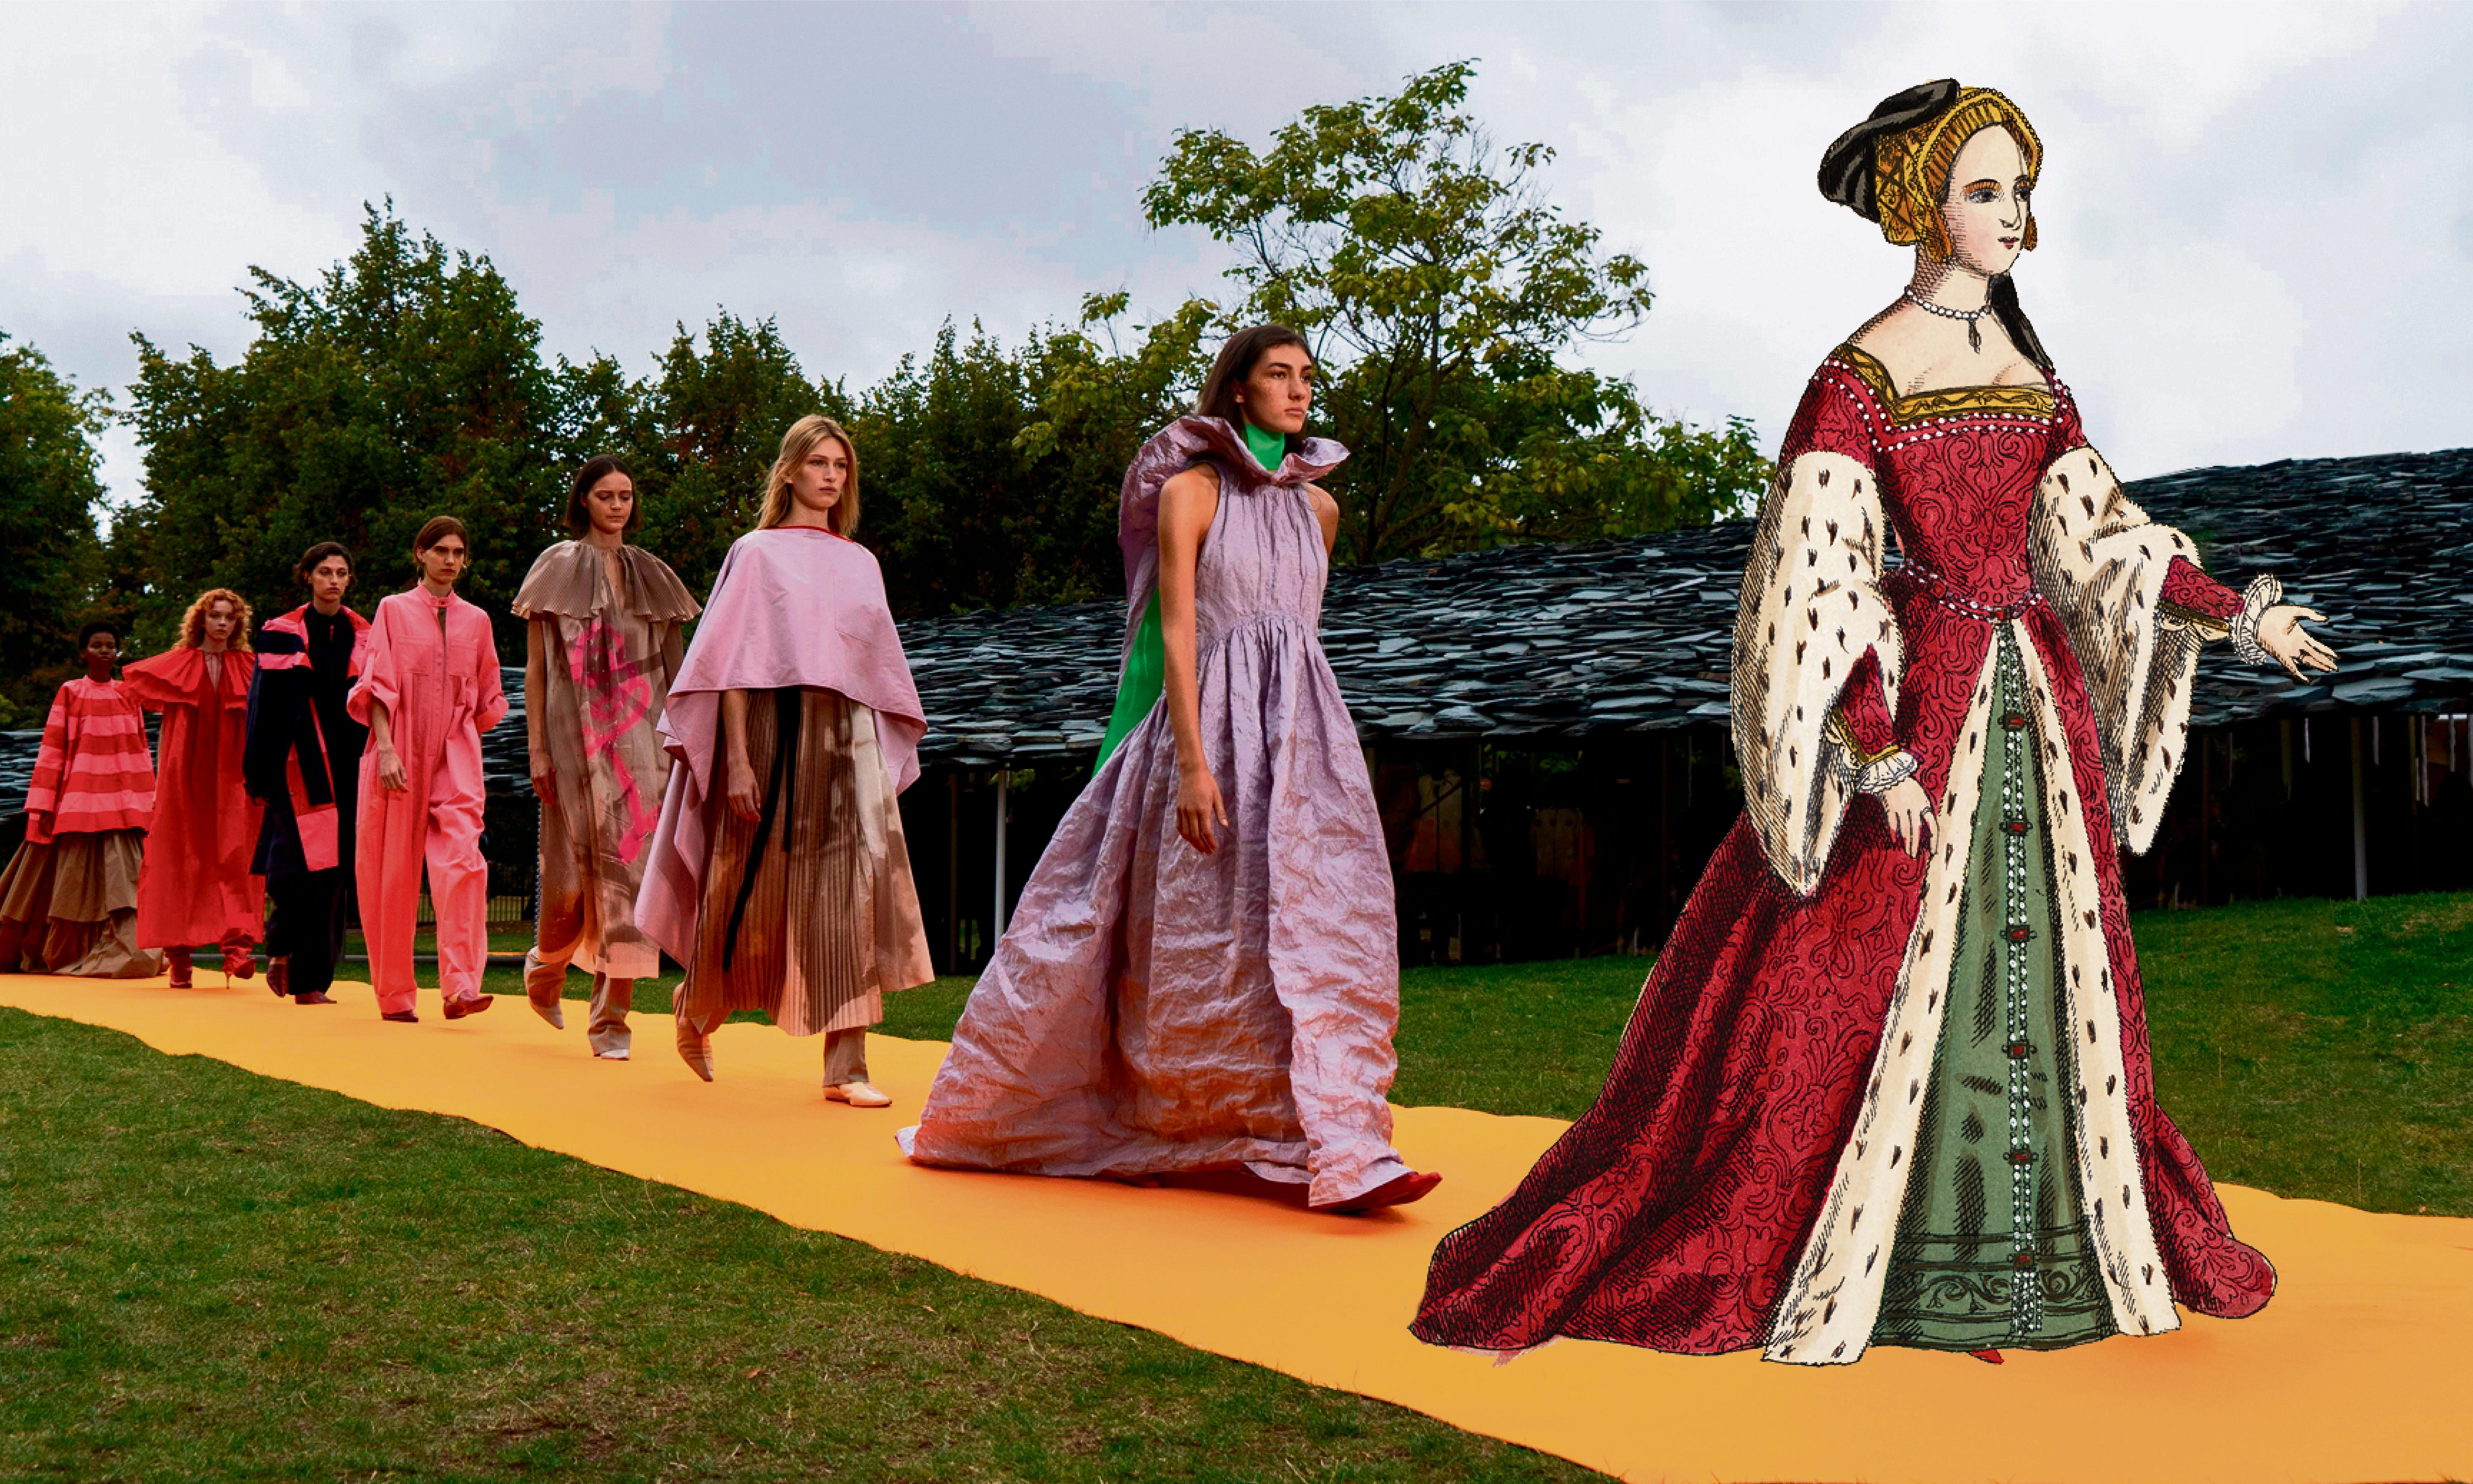 Renaissancecore: why everyone is dressing like Anne Boleyn